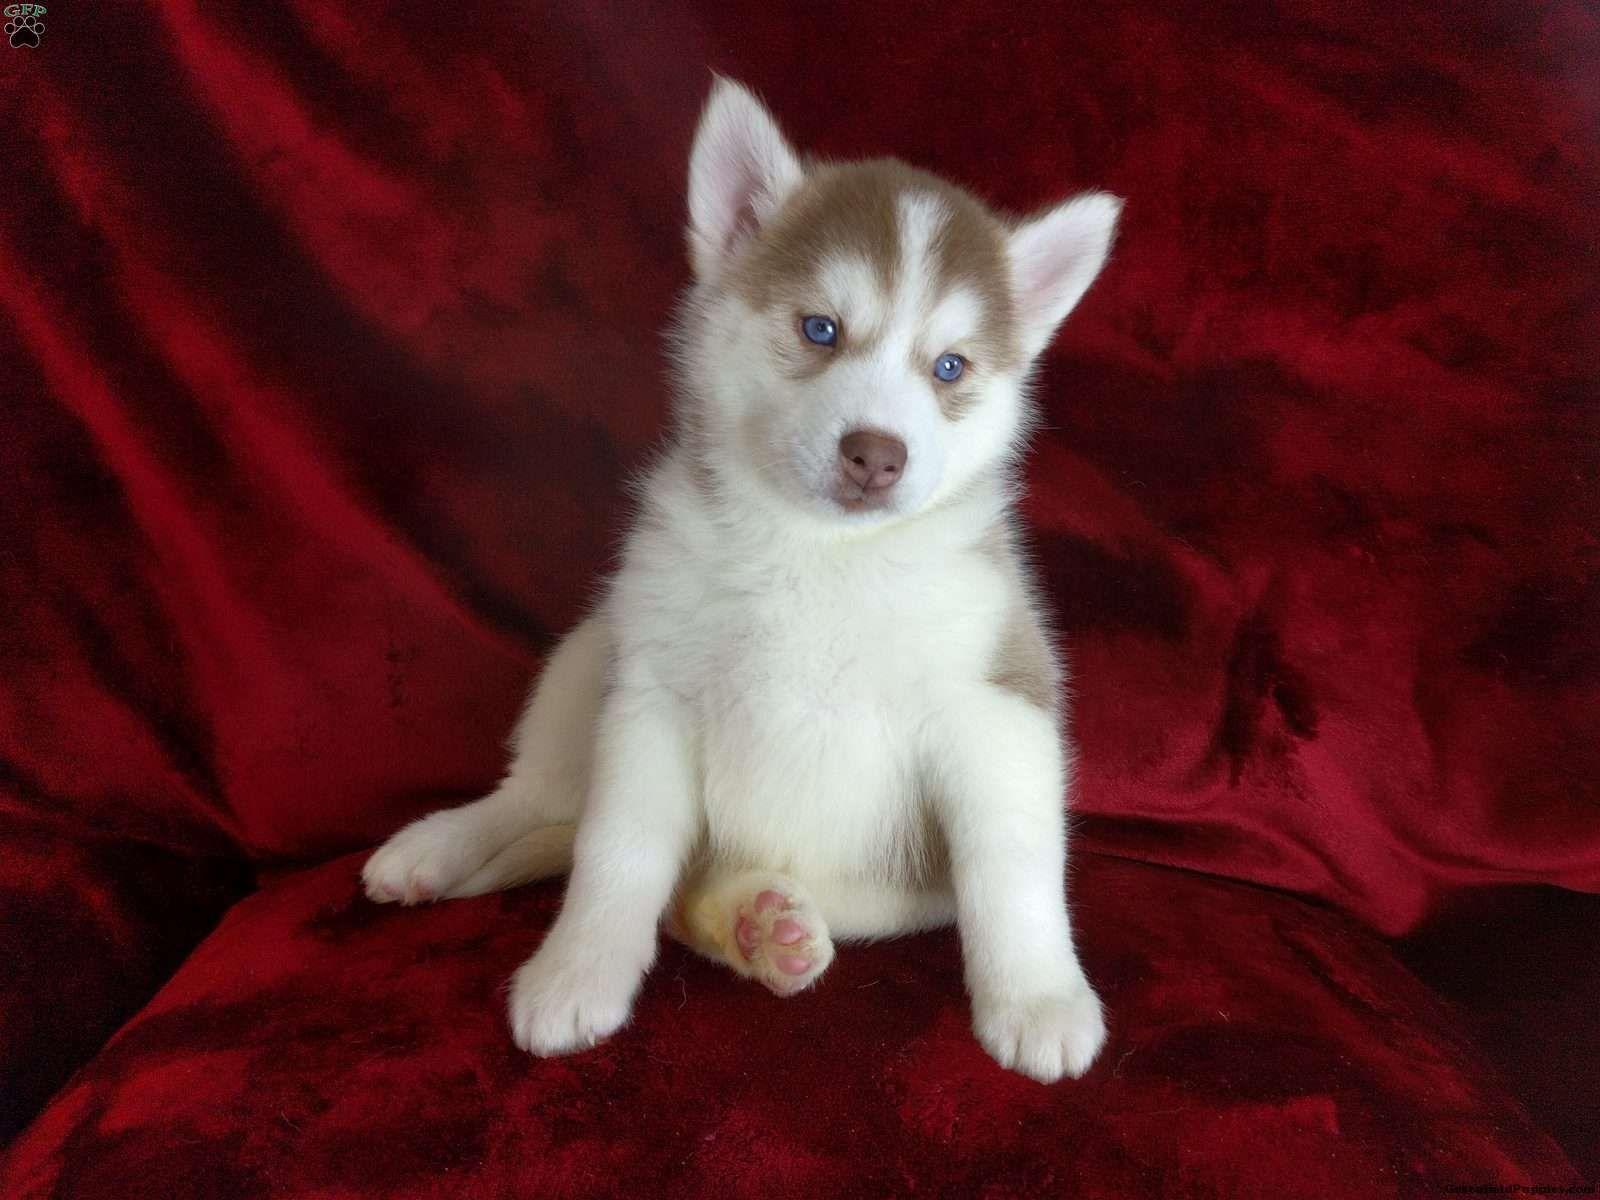 Litter Of 6 Siberian Husky Puppies For Sale In Los Angeles Ca Adn 47736 On Puppyfinder Com Gender Male S And Husky Puppies For Sale Husky Puppies For Sale